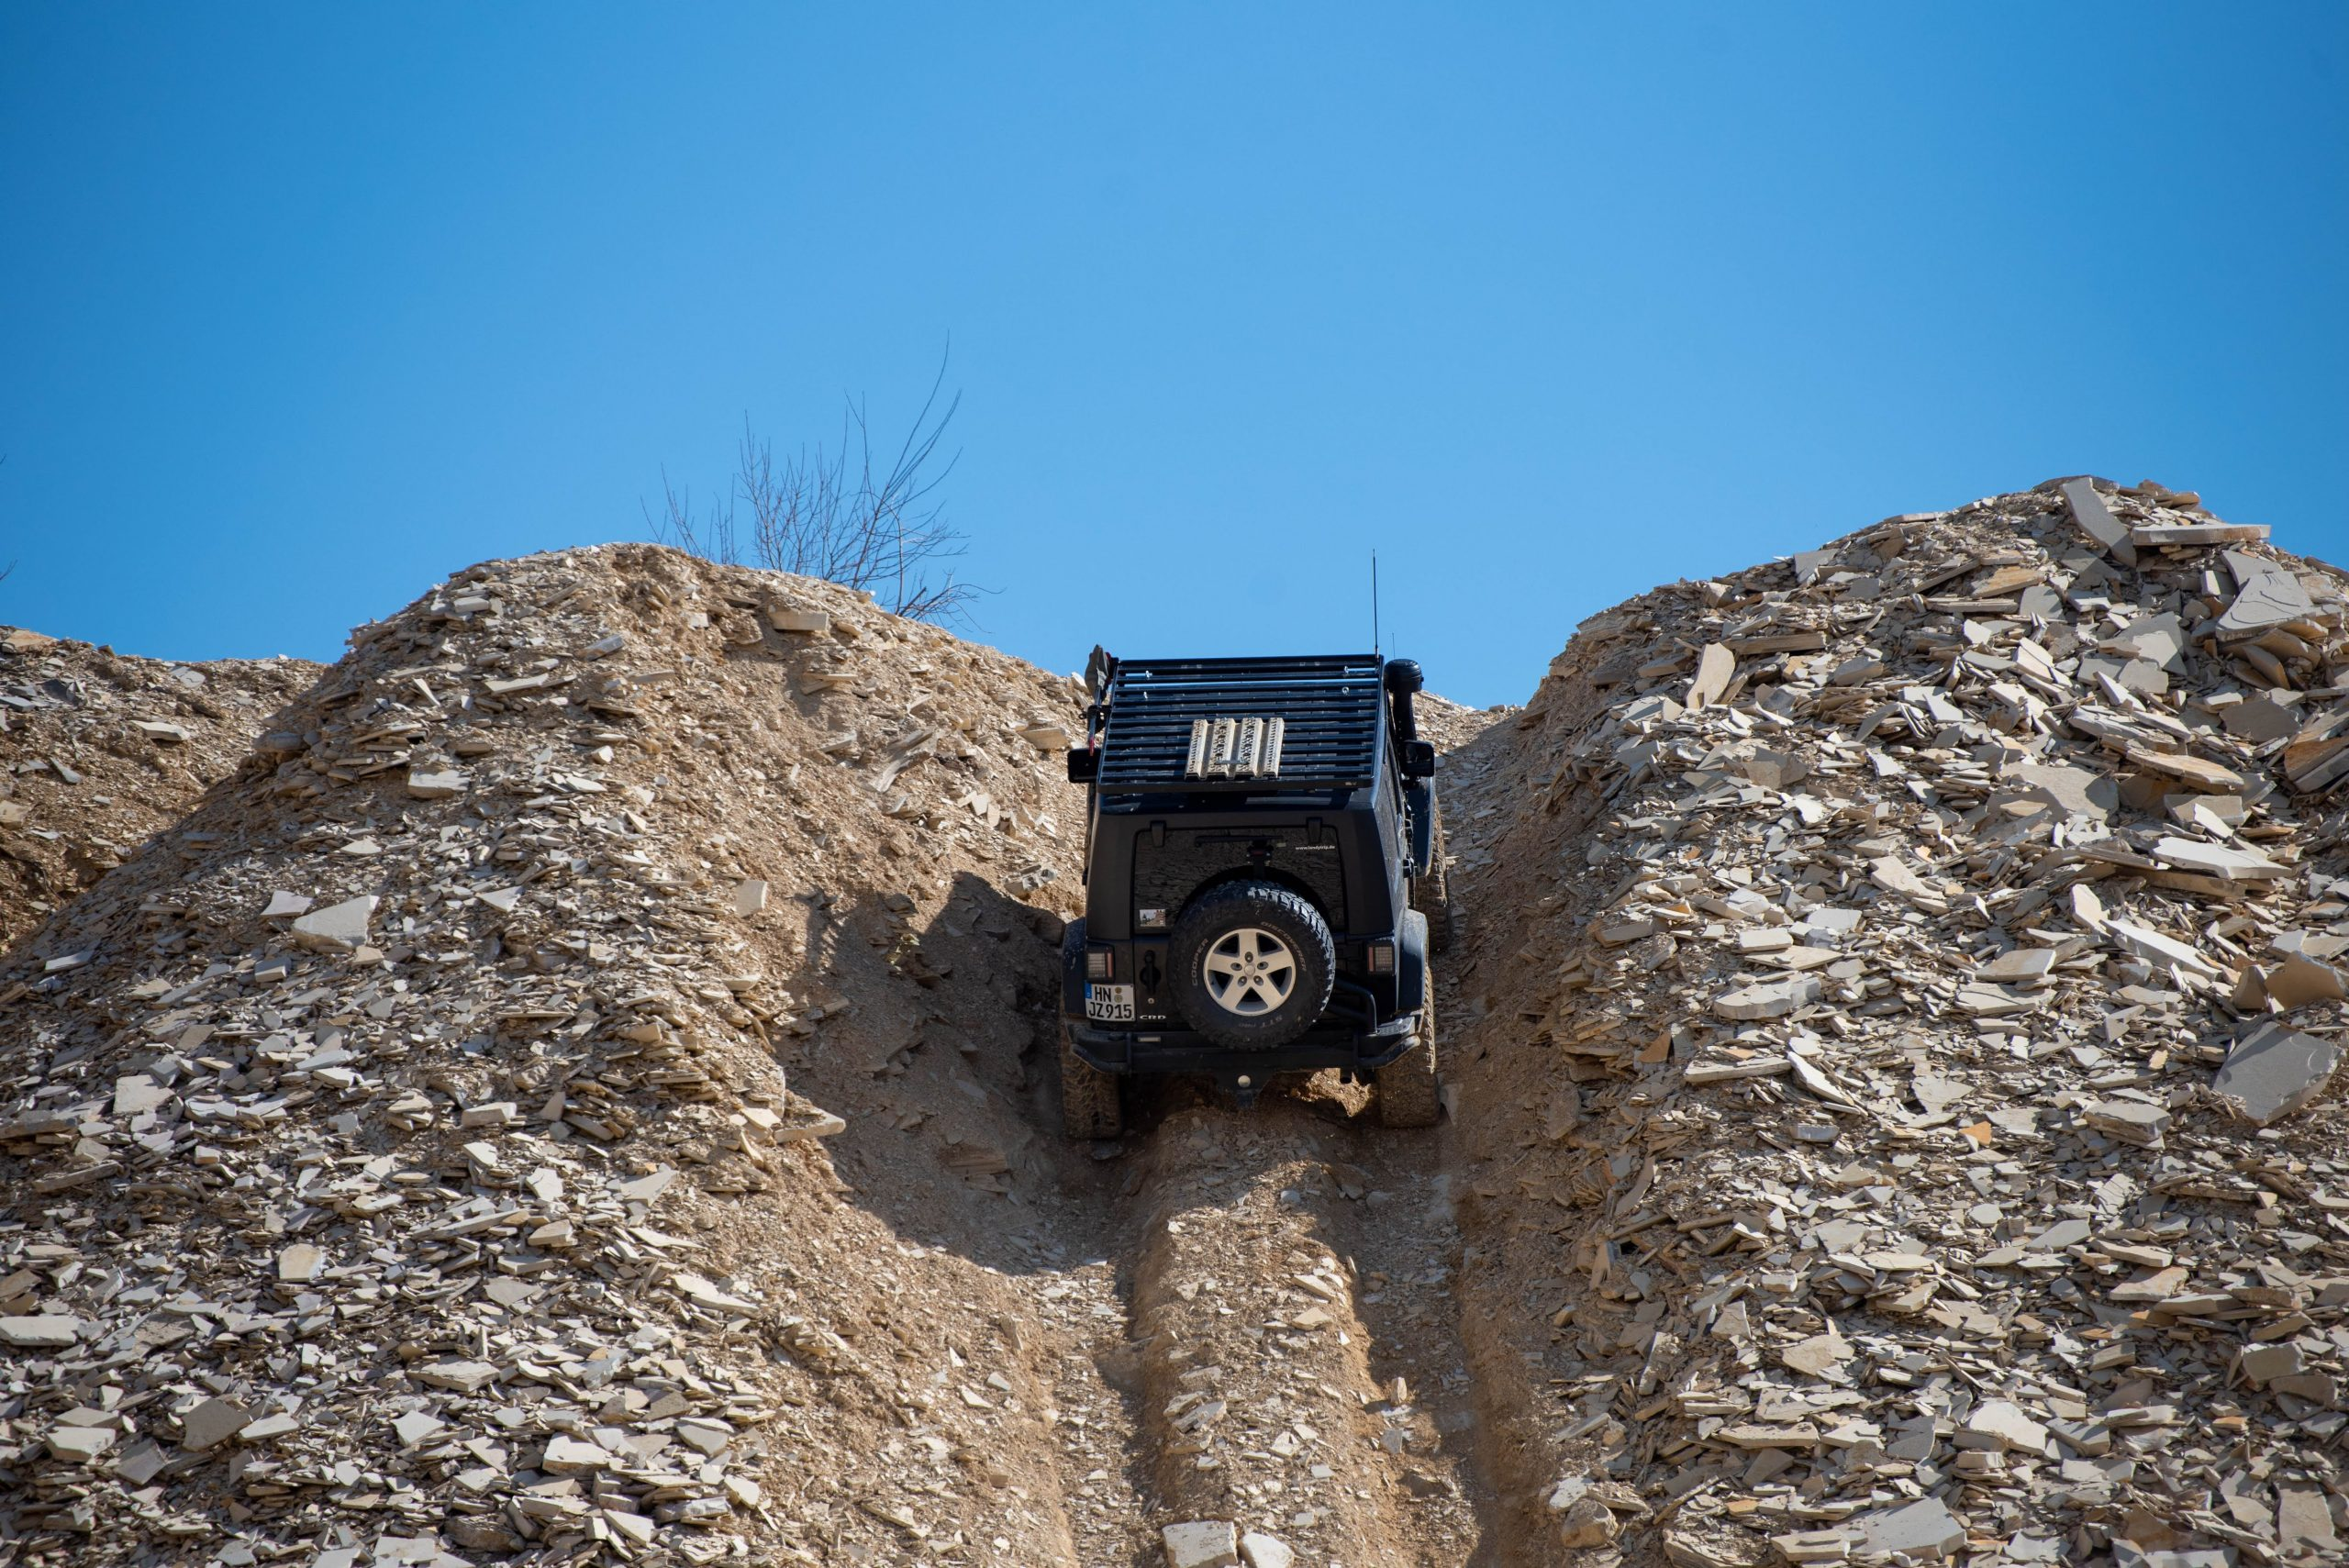 jeep crd wrangler euro spec quarry off road uphill